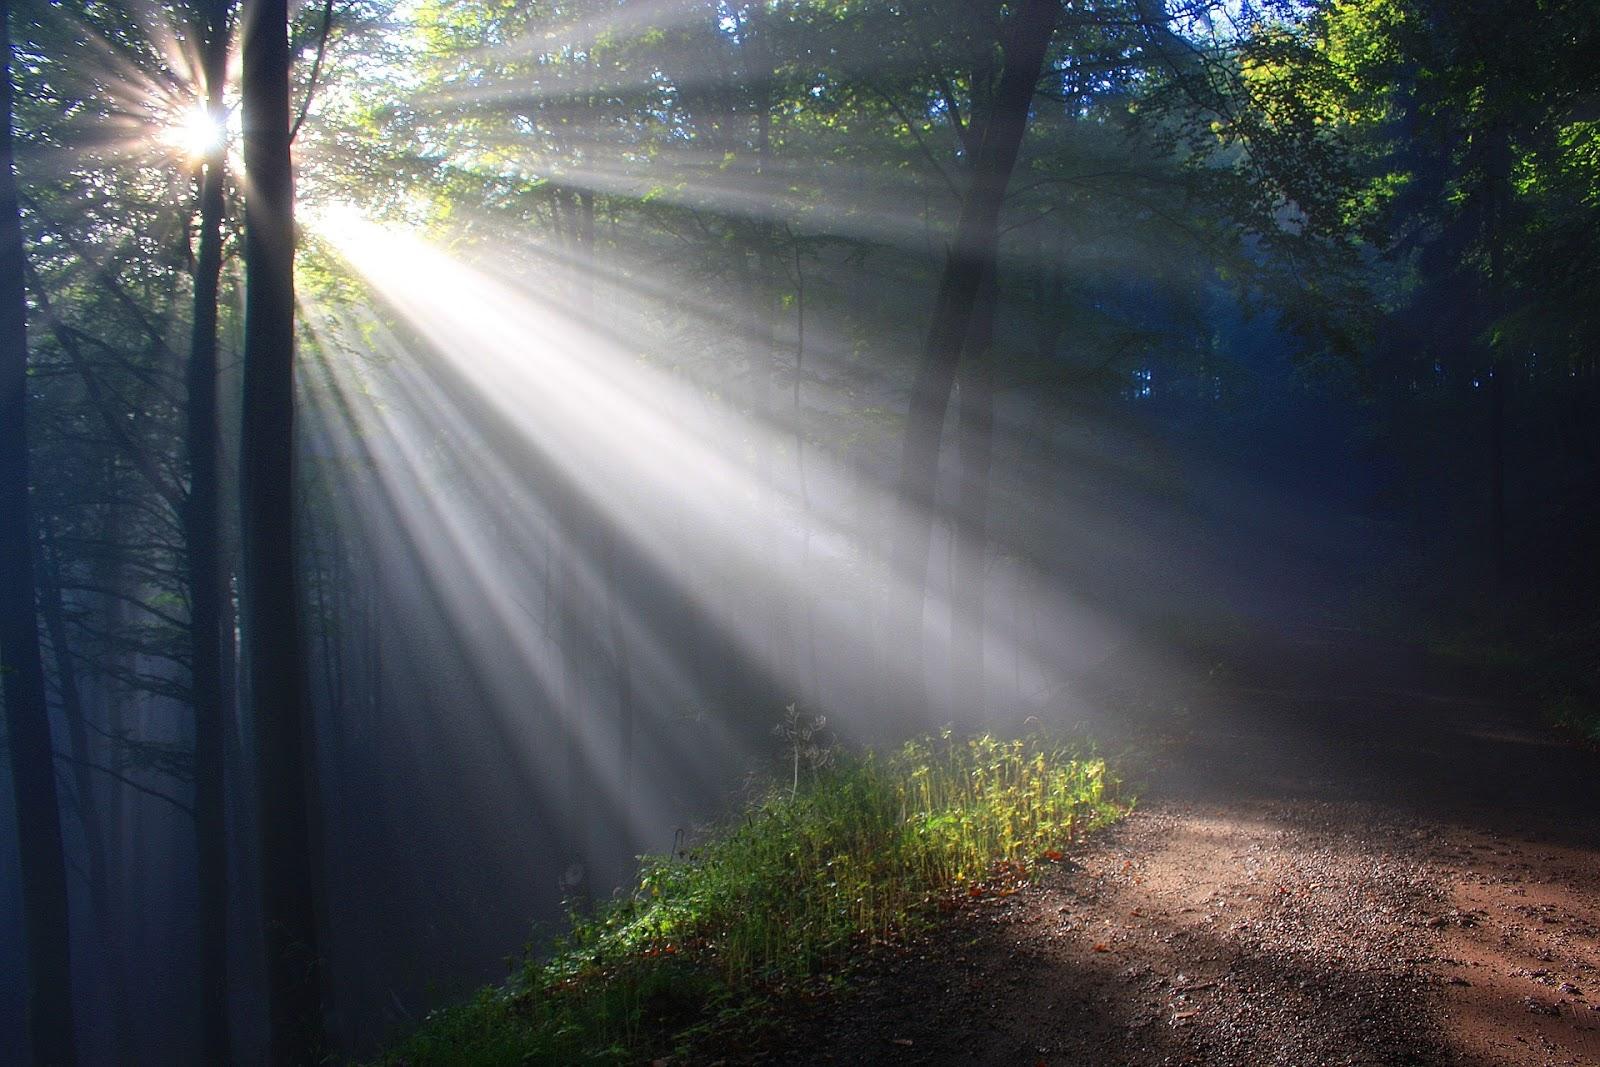 76 Gambar Pemandangan Hutan Indah Terbaik